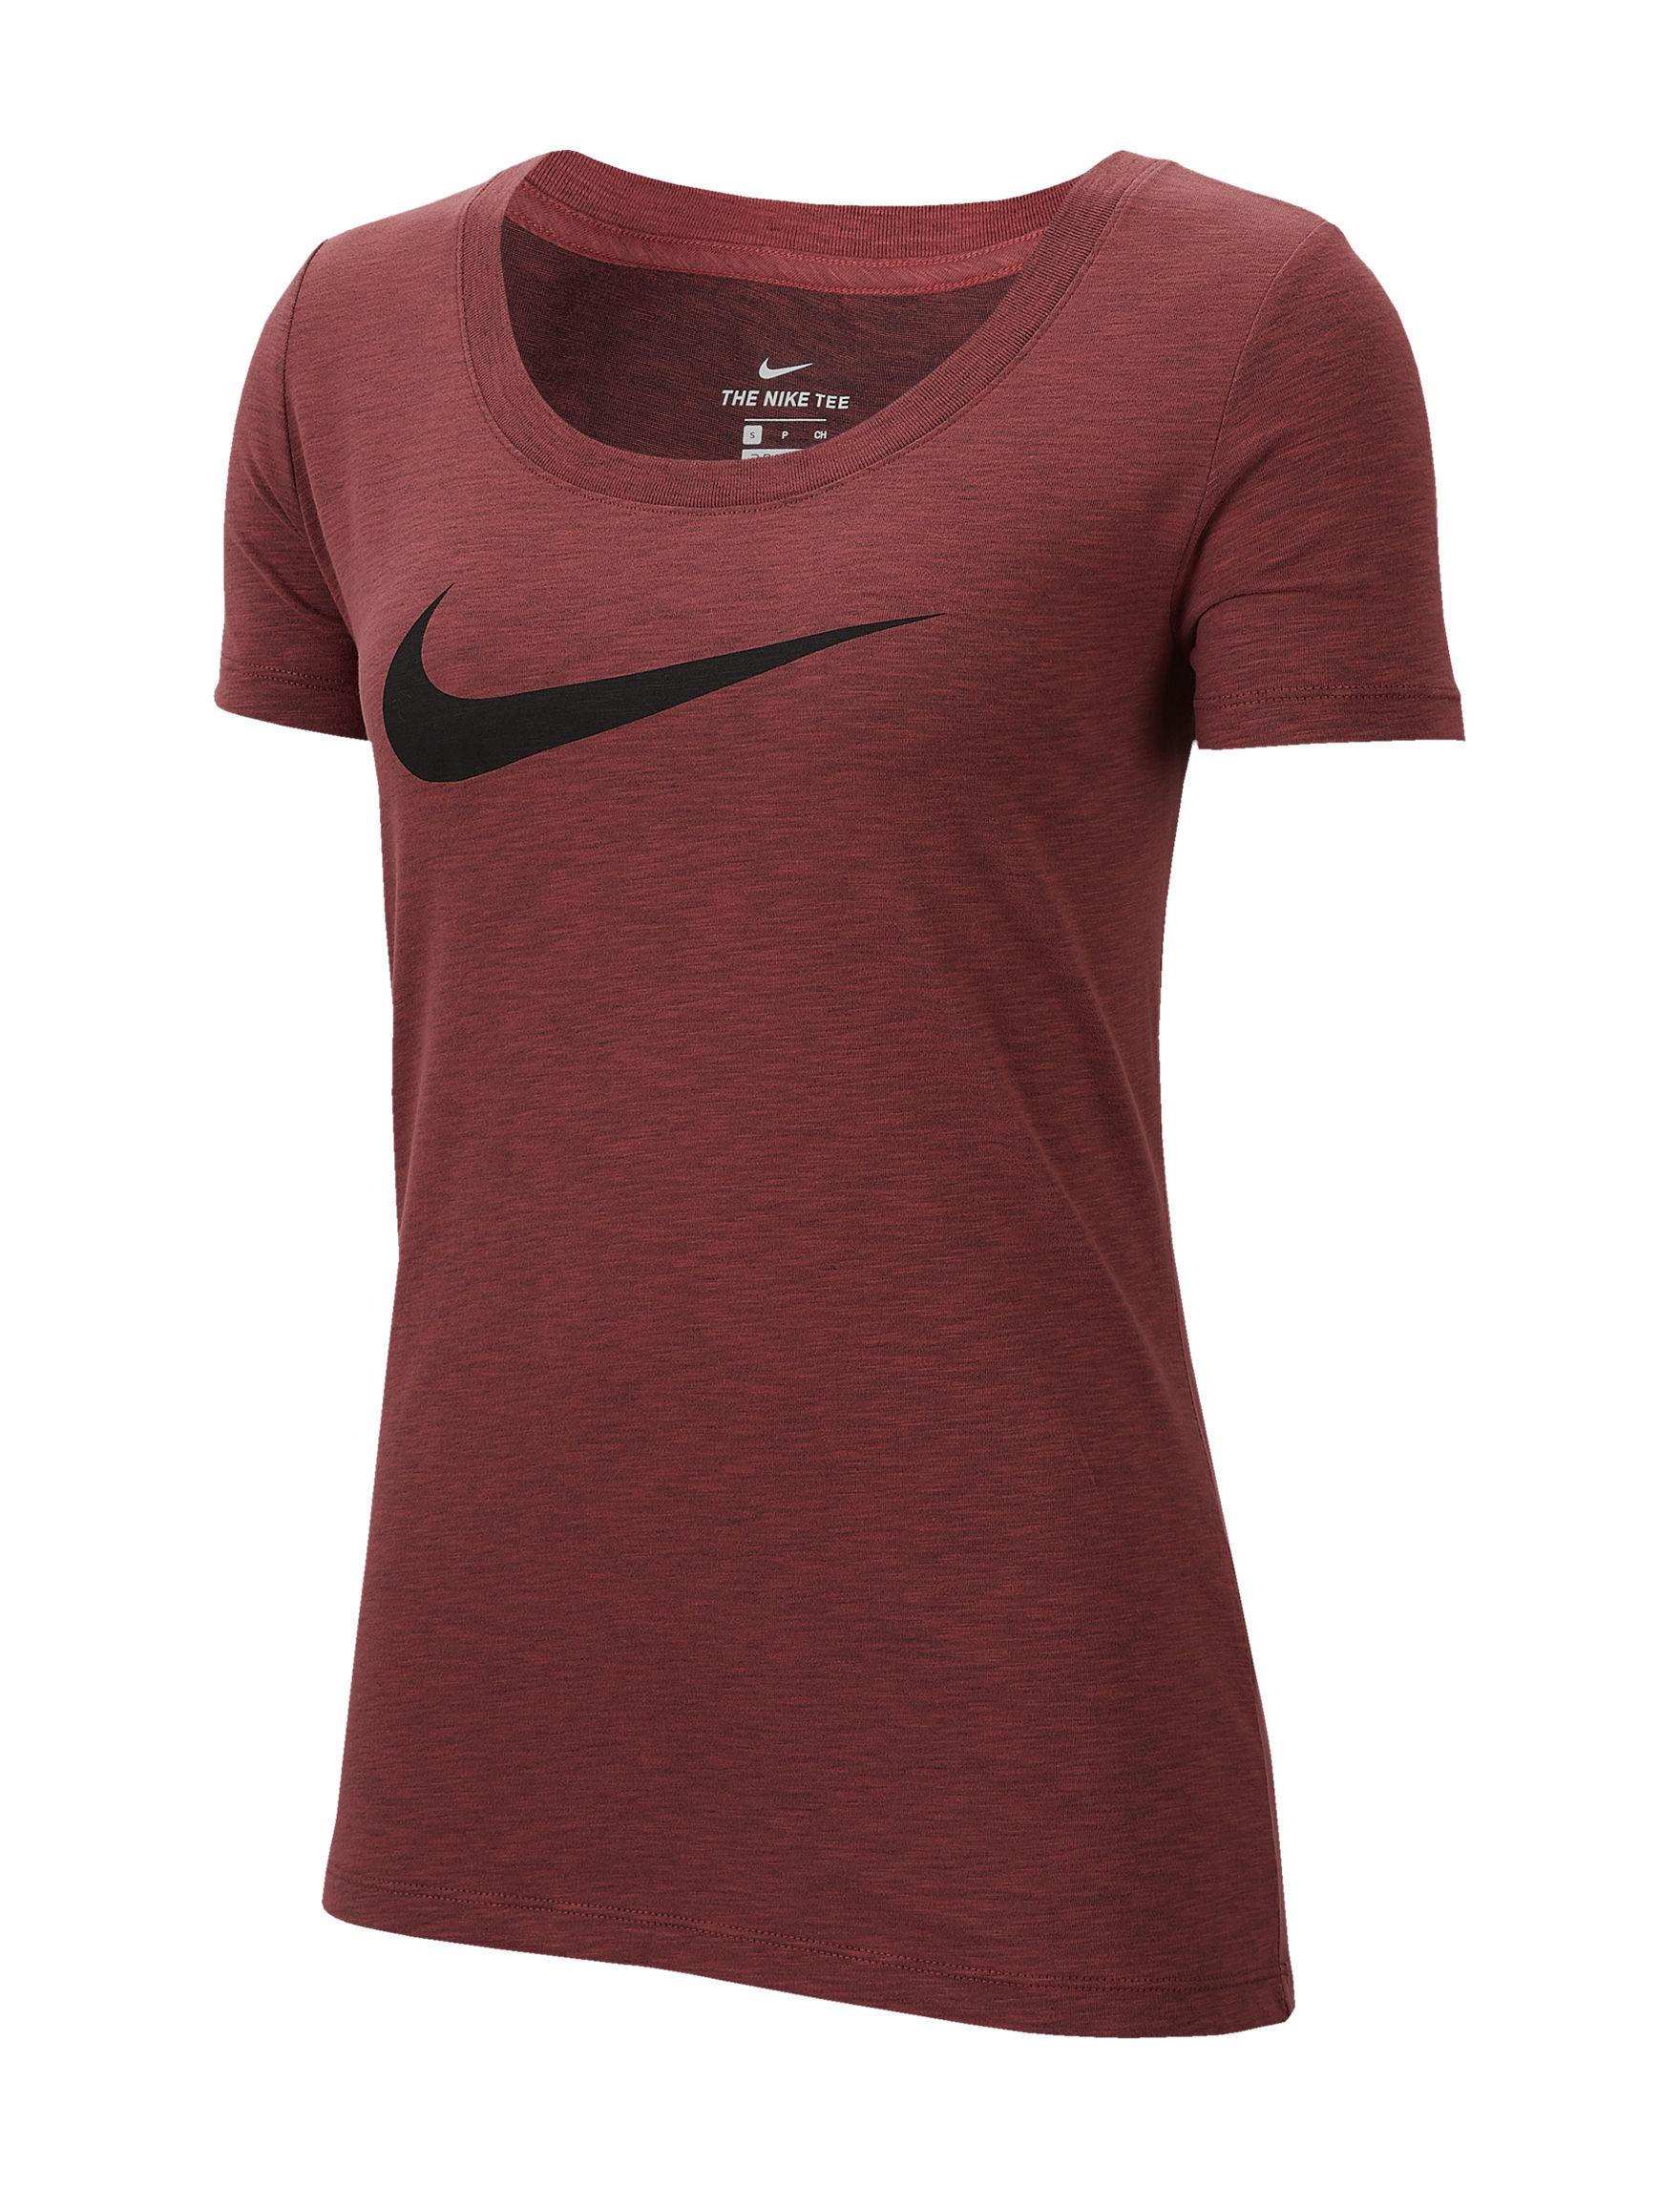 Nike Cedar Heather Active Tees & Tanks